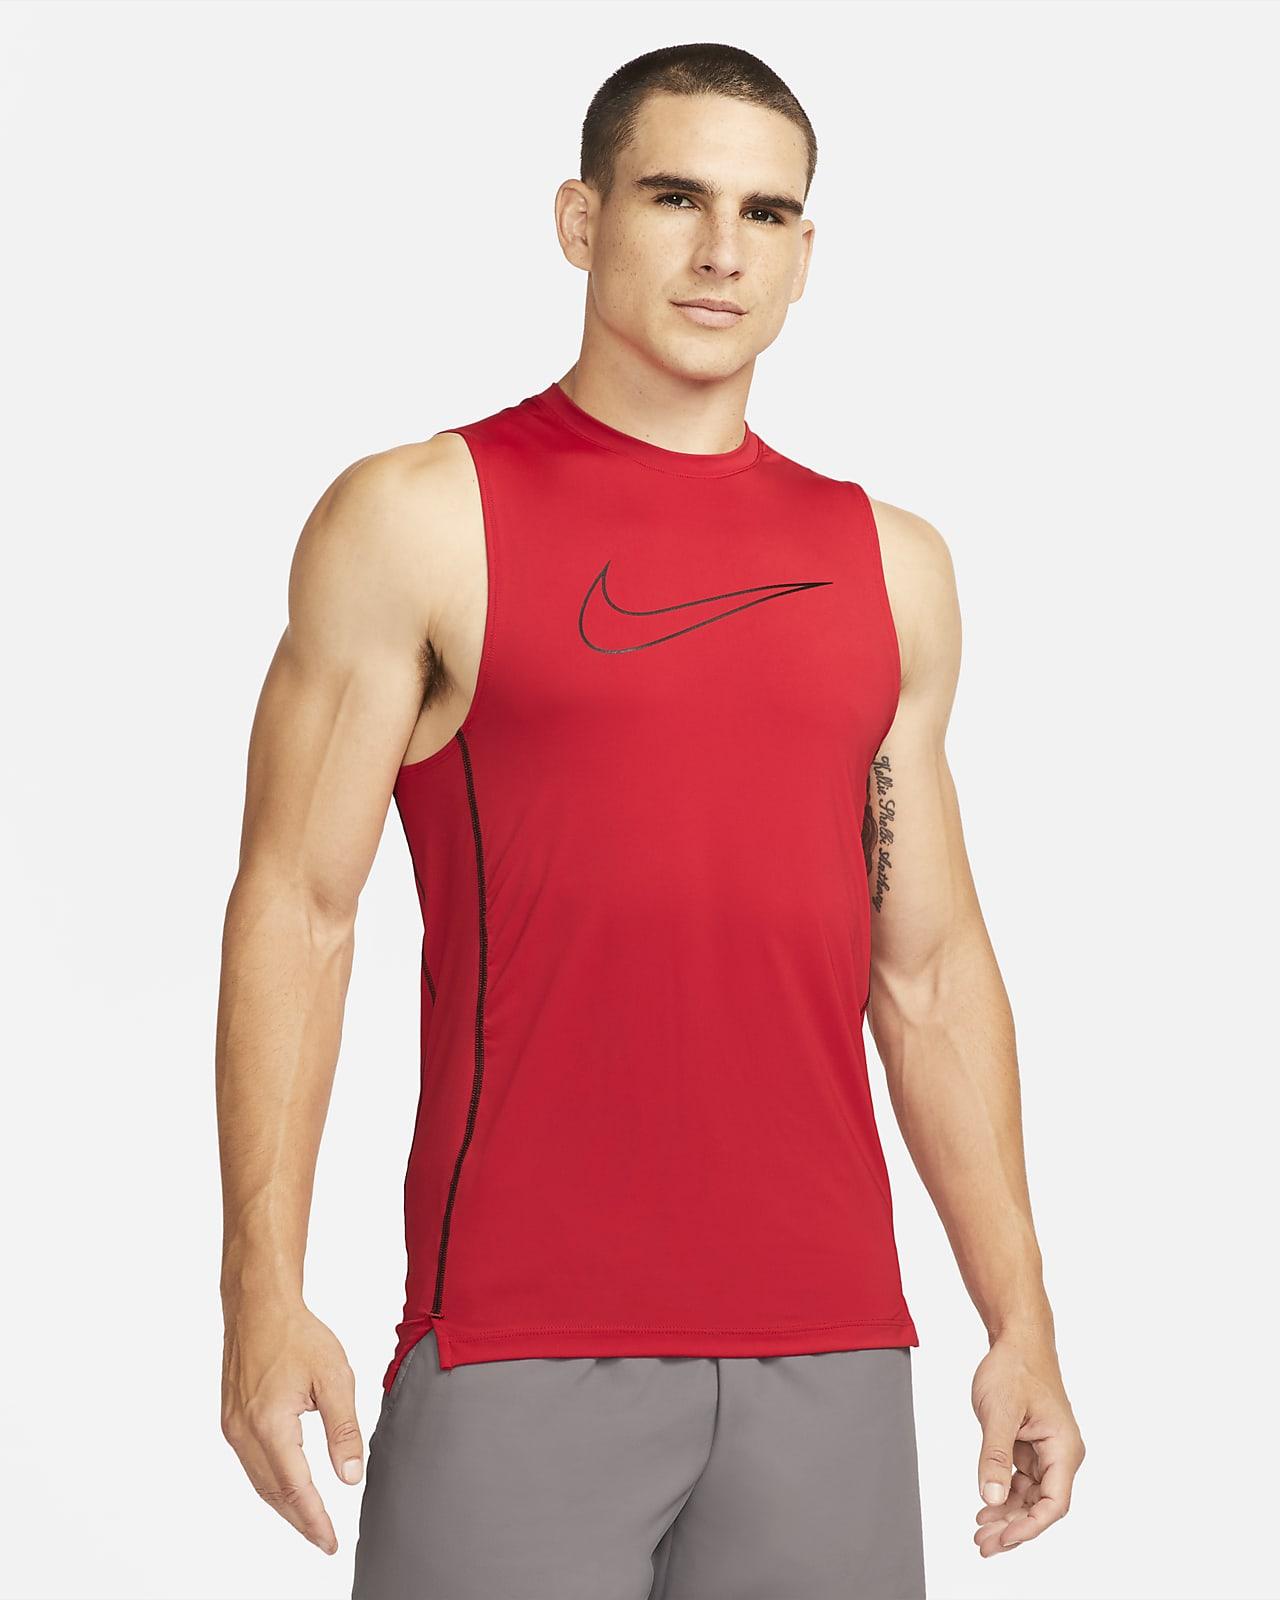 Camiseta sinmangas y ajuste slim para hombre Nike Pro Dri-FIT